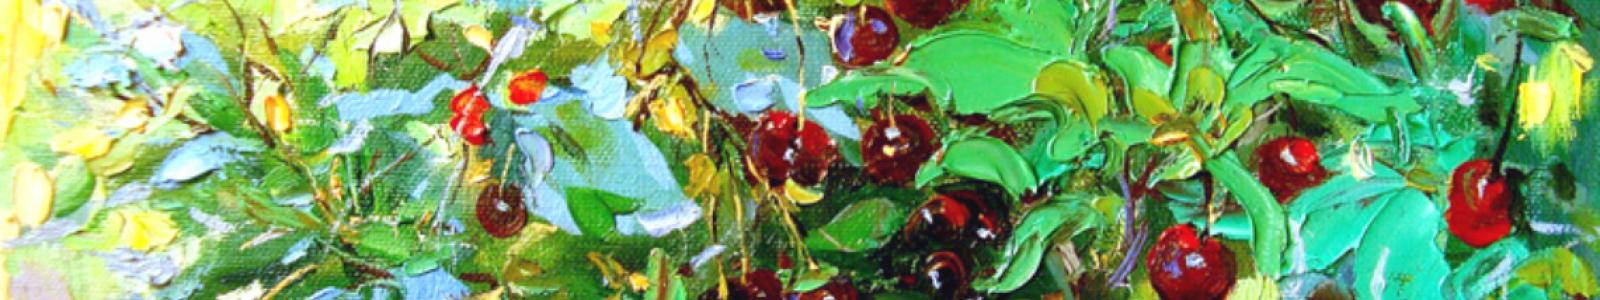 Gallery Painter Andrey Mishagin